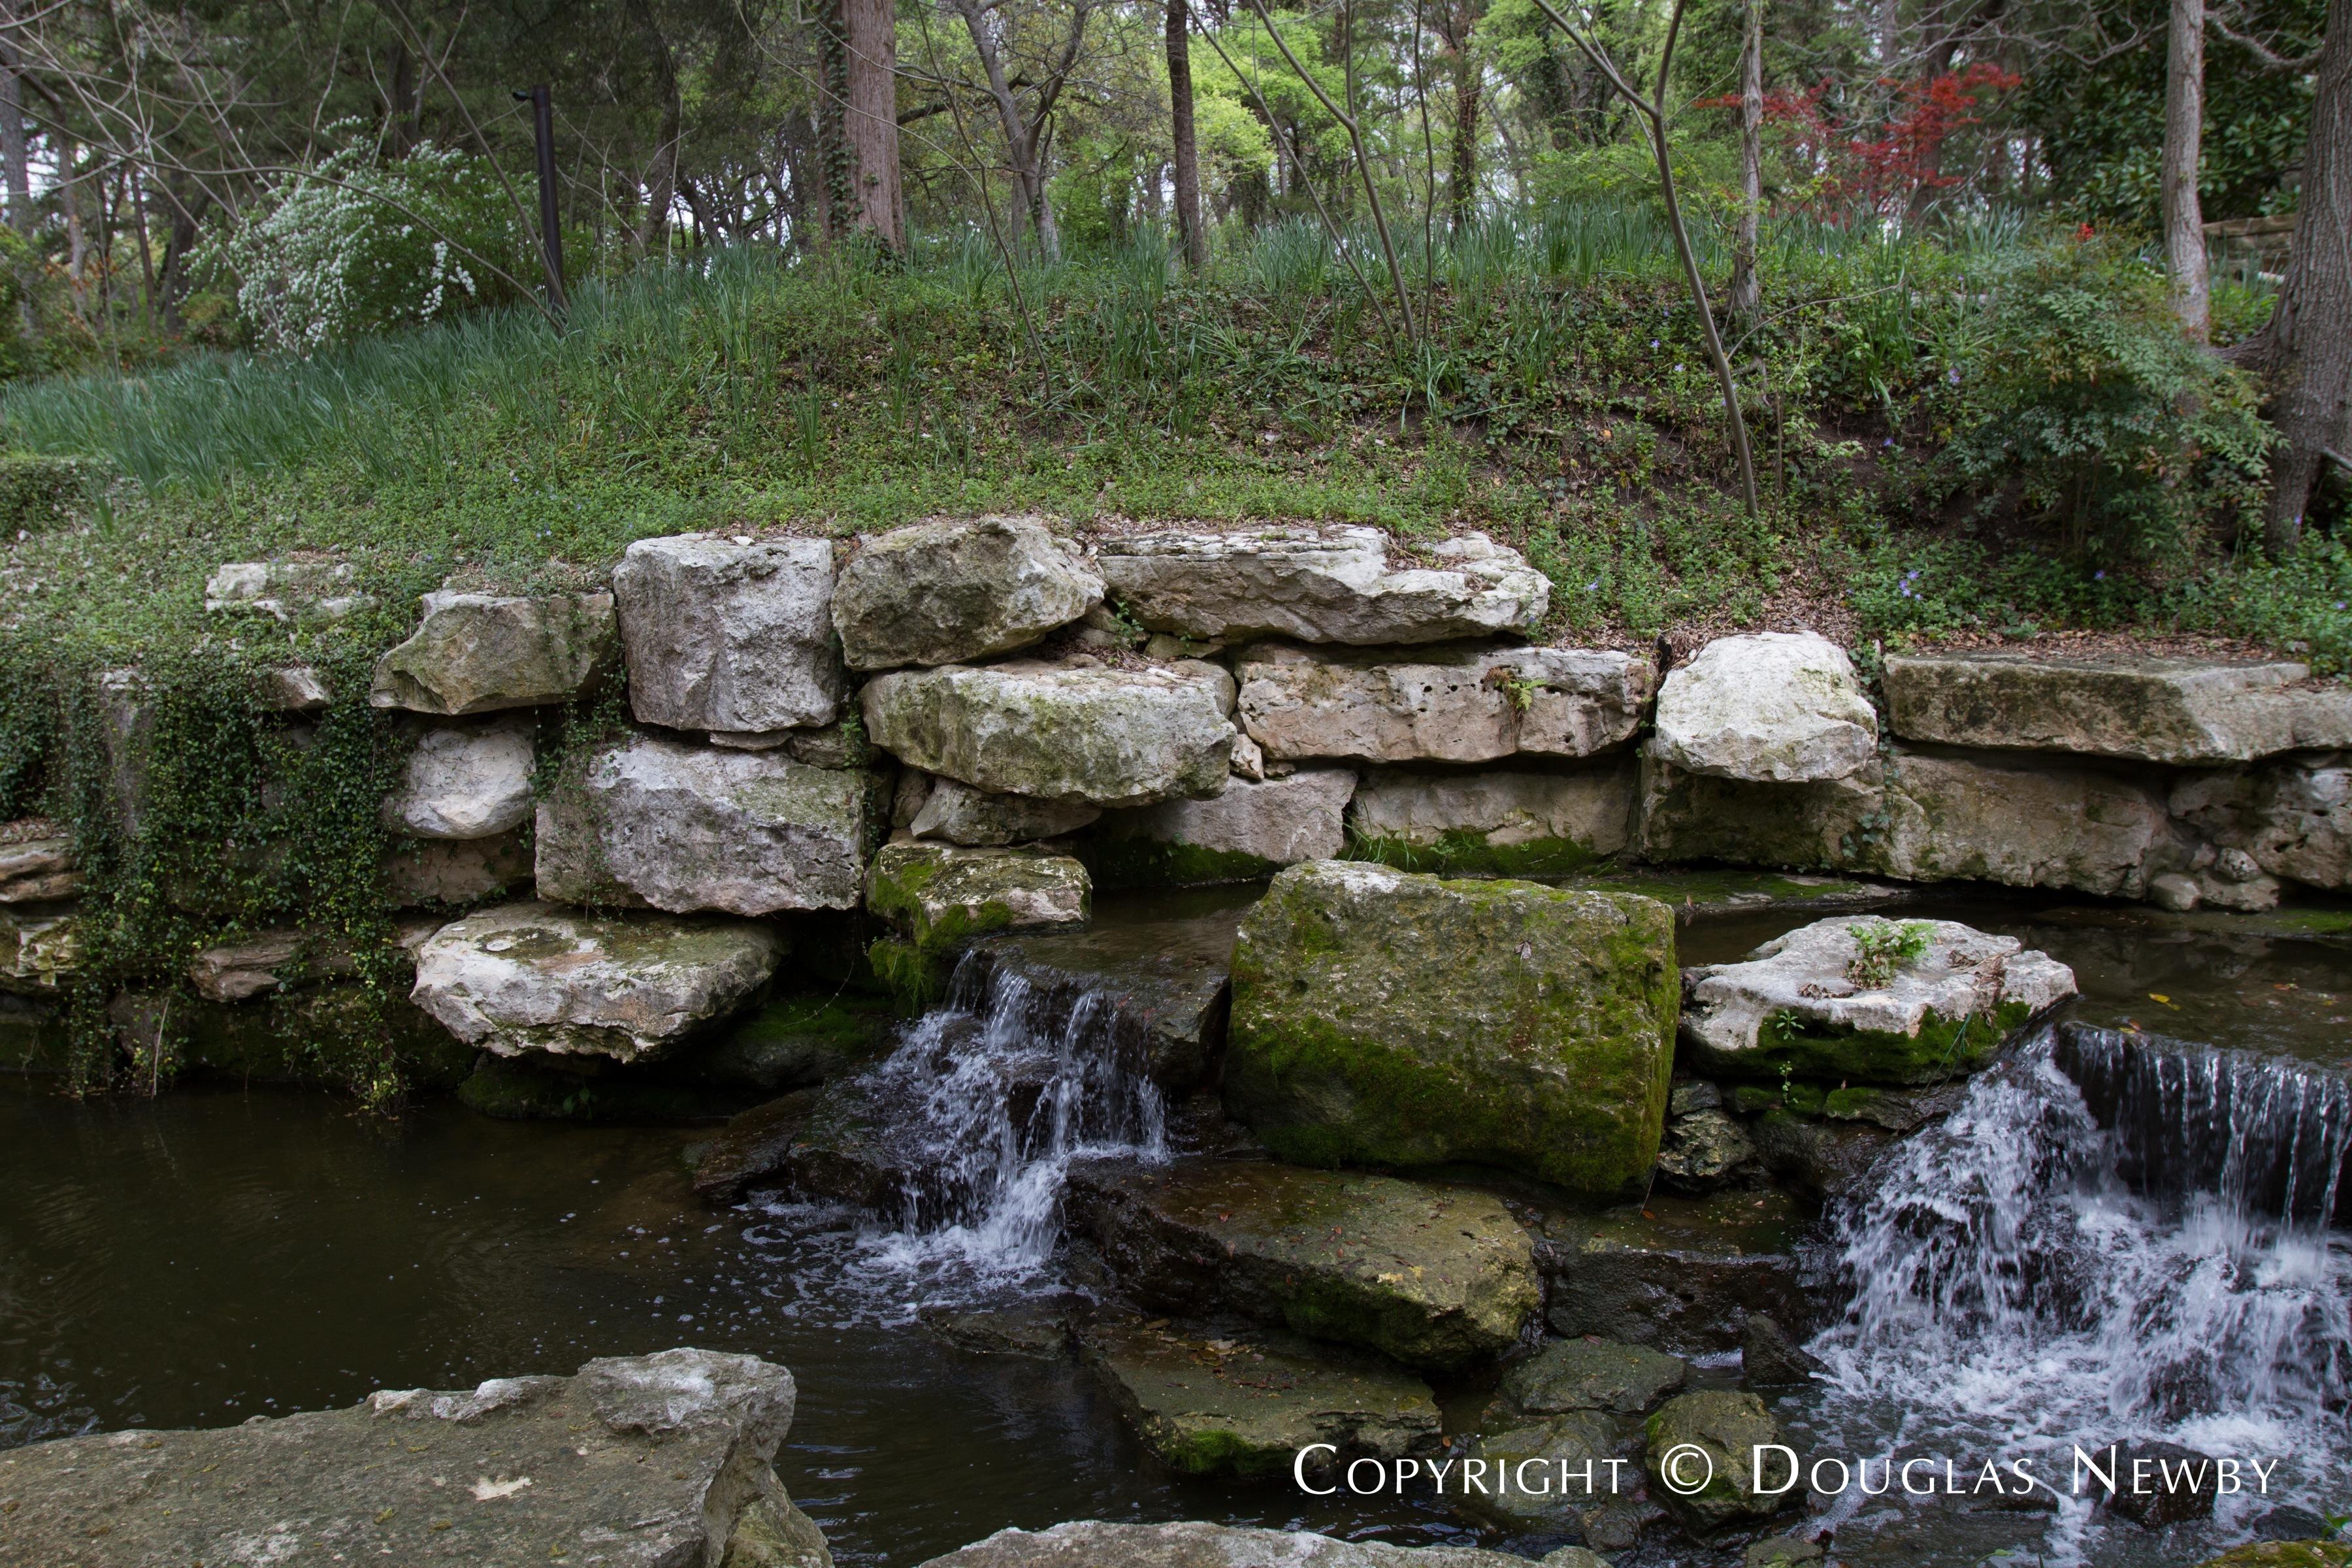 Stream in Forest on Dallas Estate Property